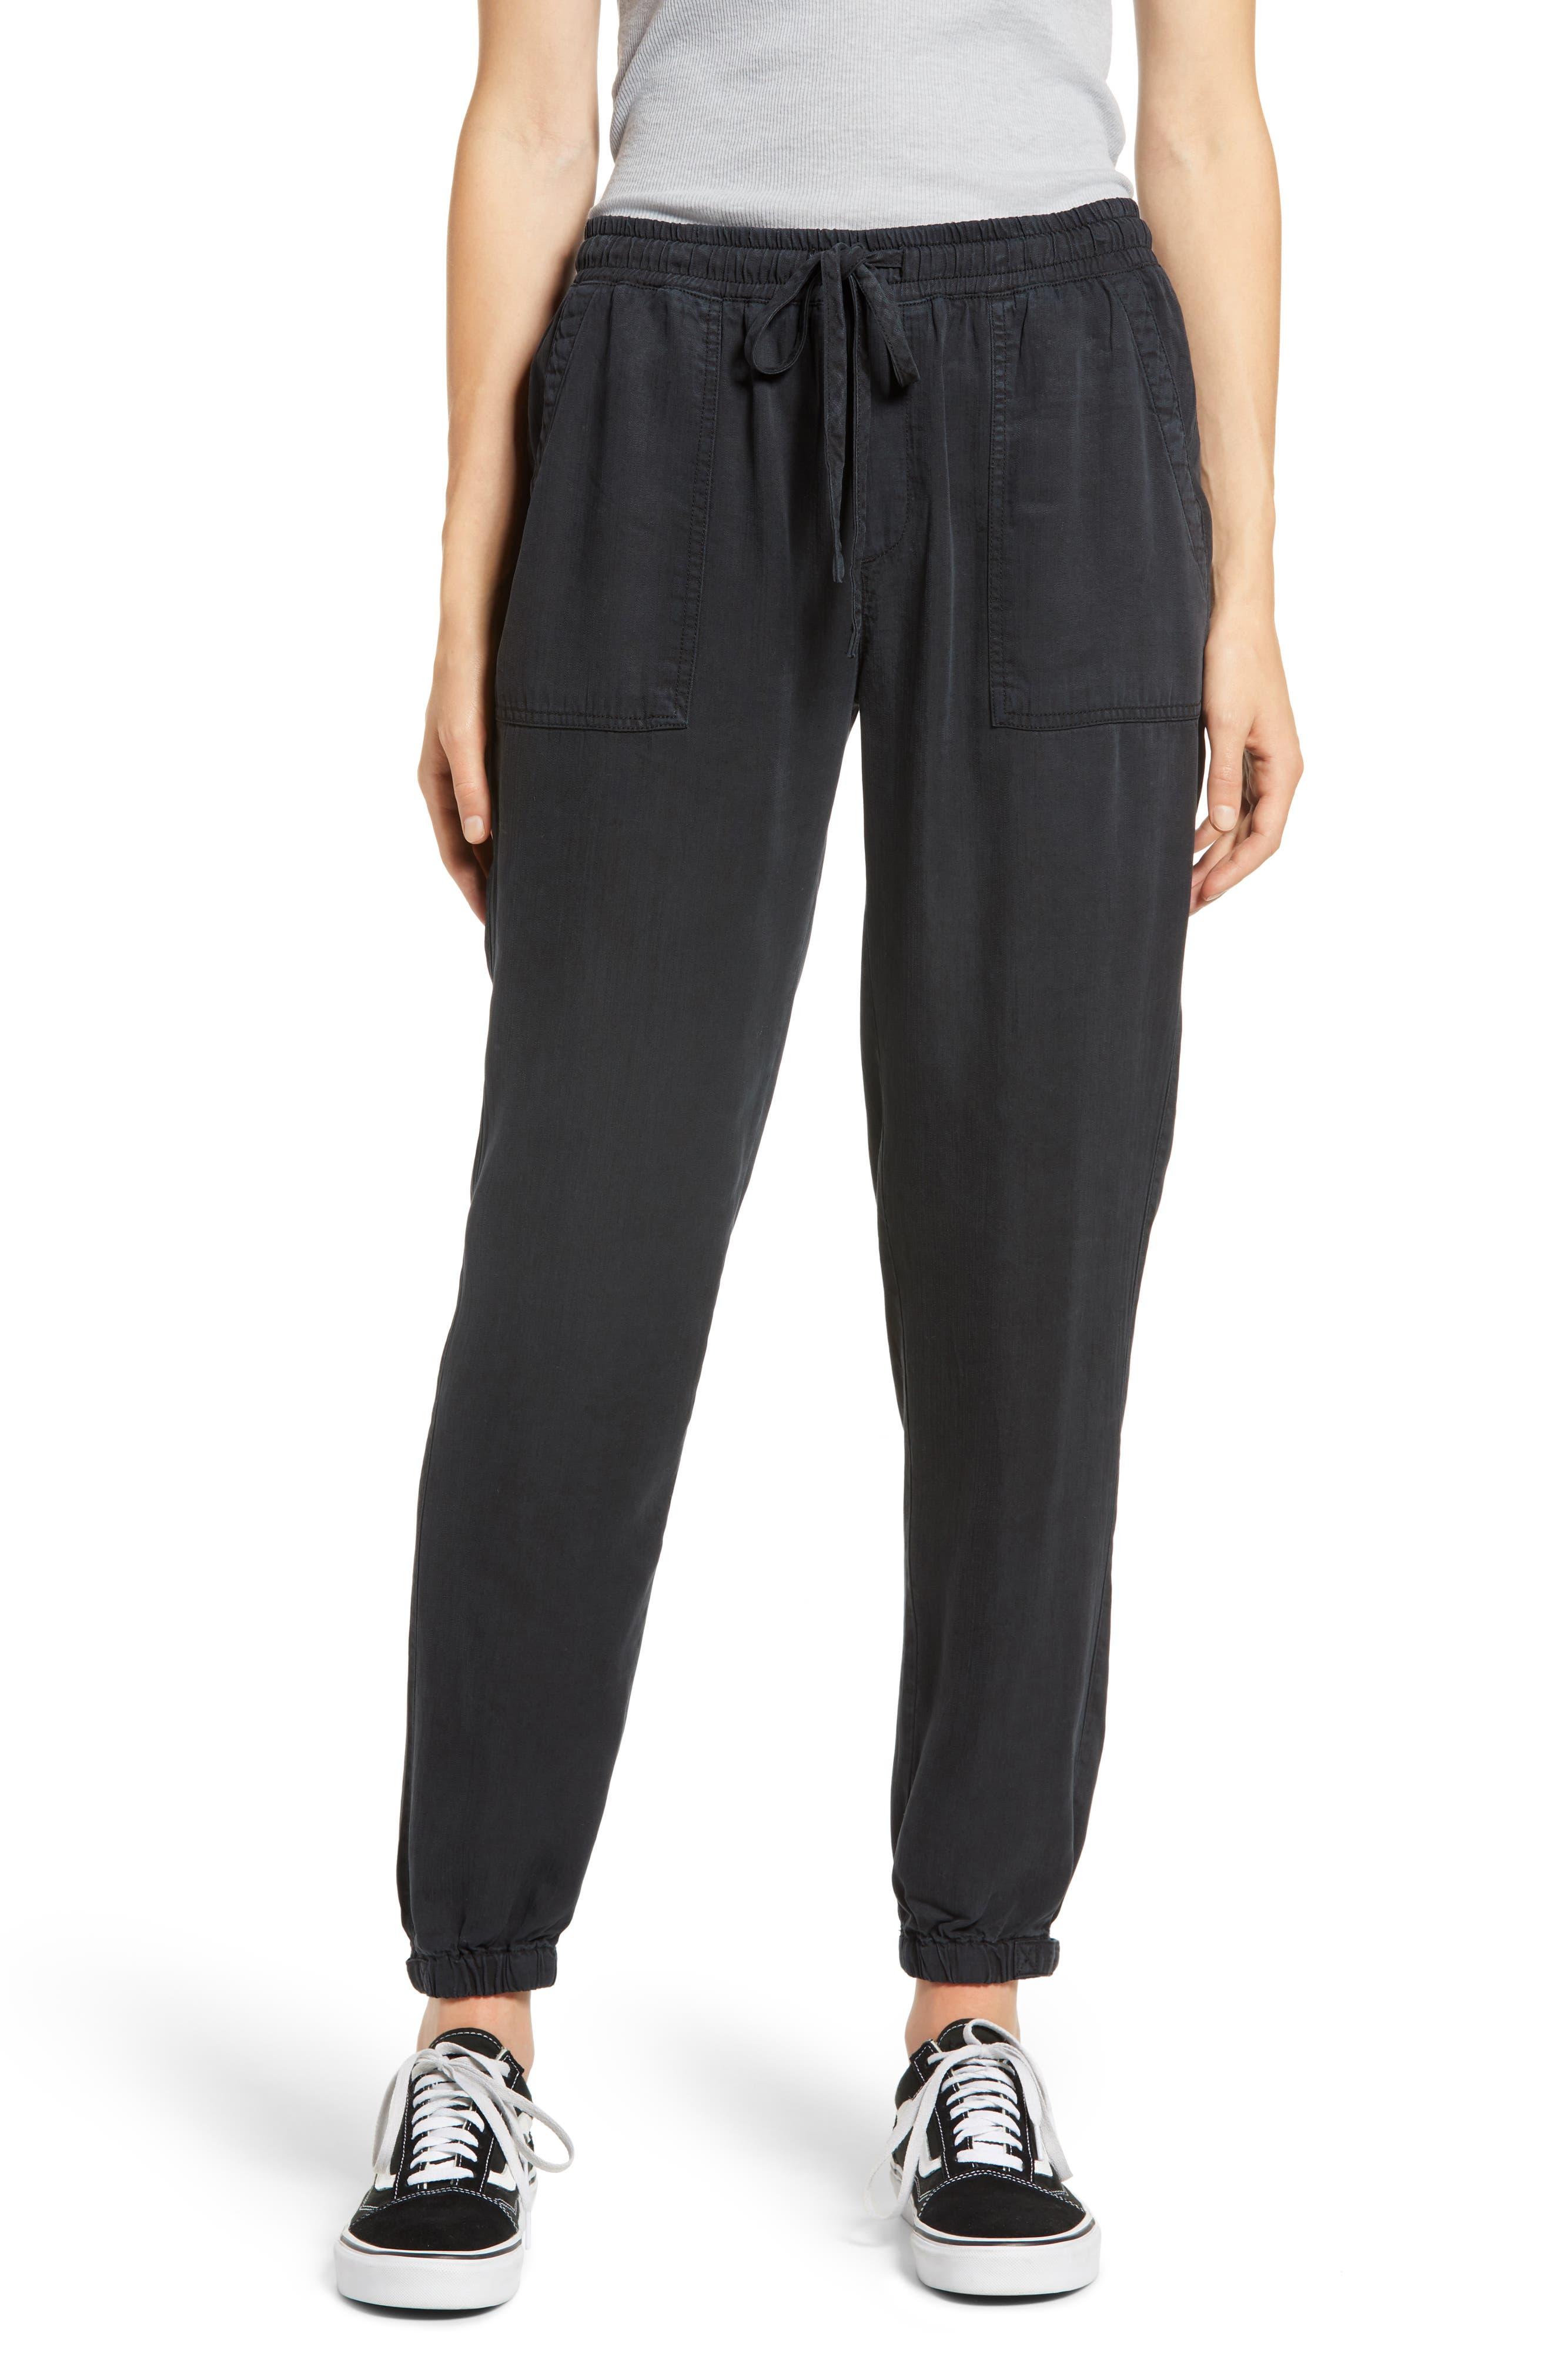 Thread & Supply Serena Jogger Pants | Nordstrom